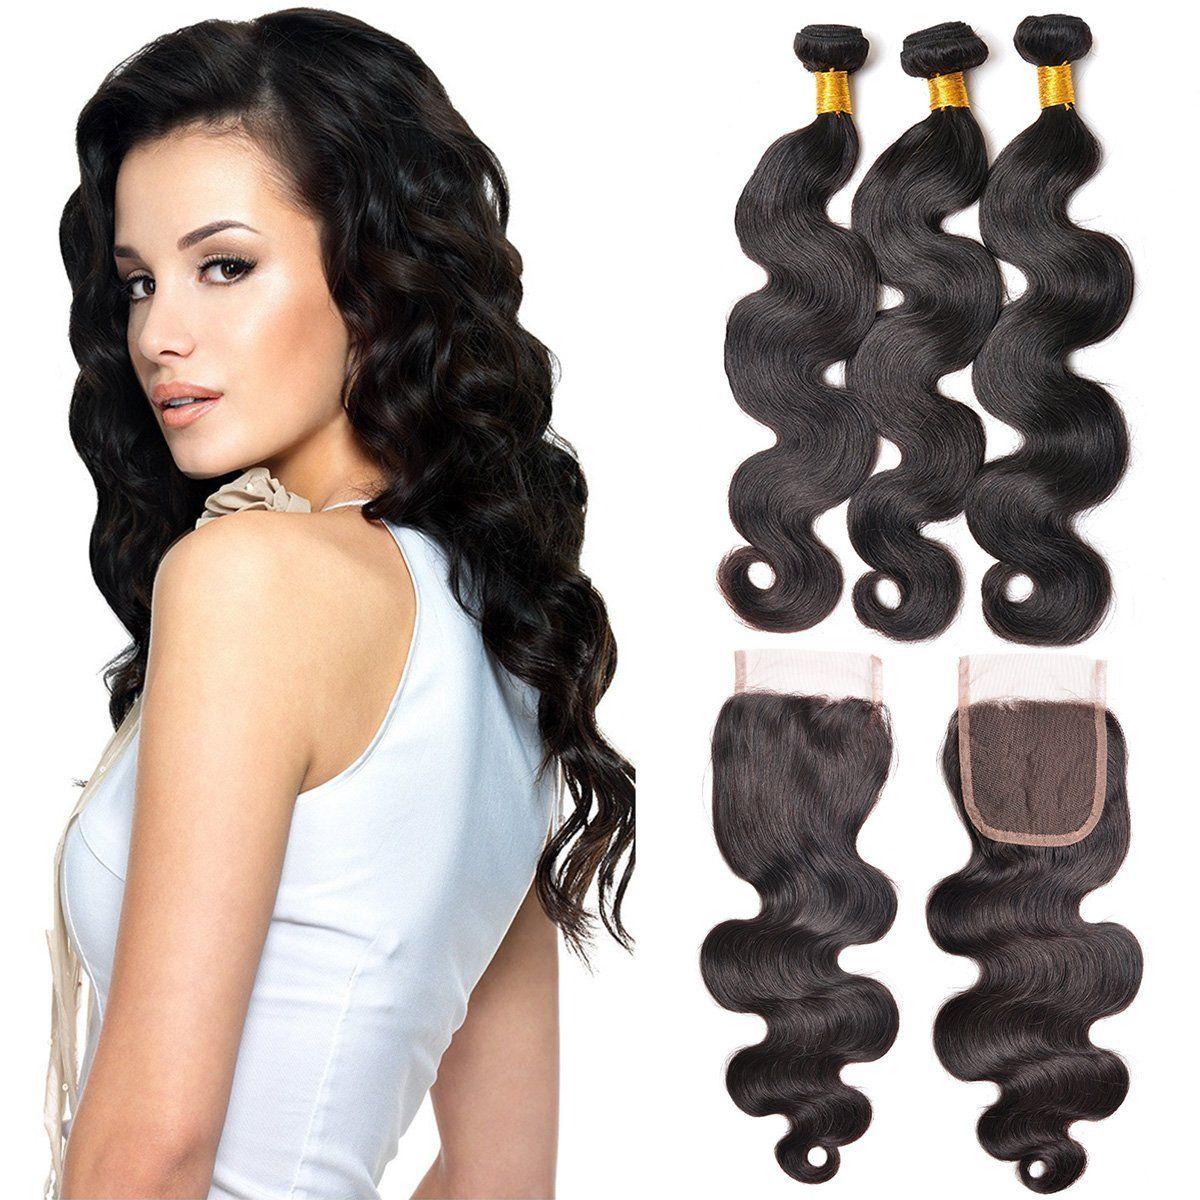 1020 Inch Virgin Brazlian Hair Loose Wavy 4*4 Three Part